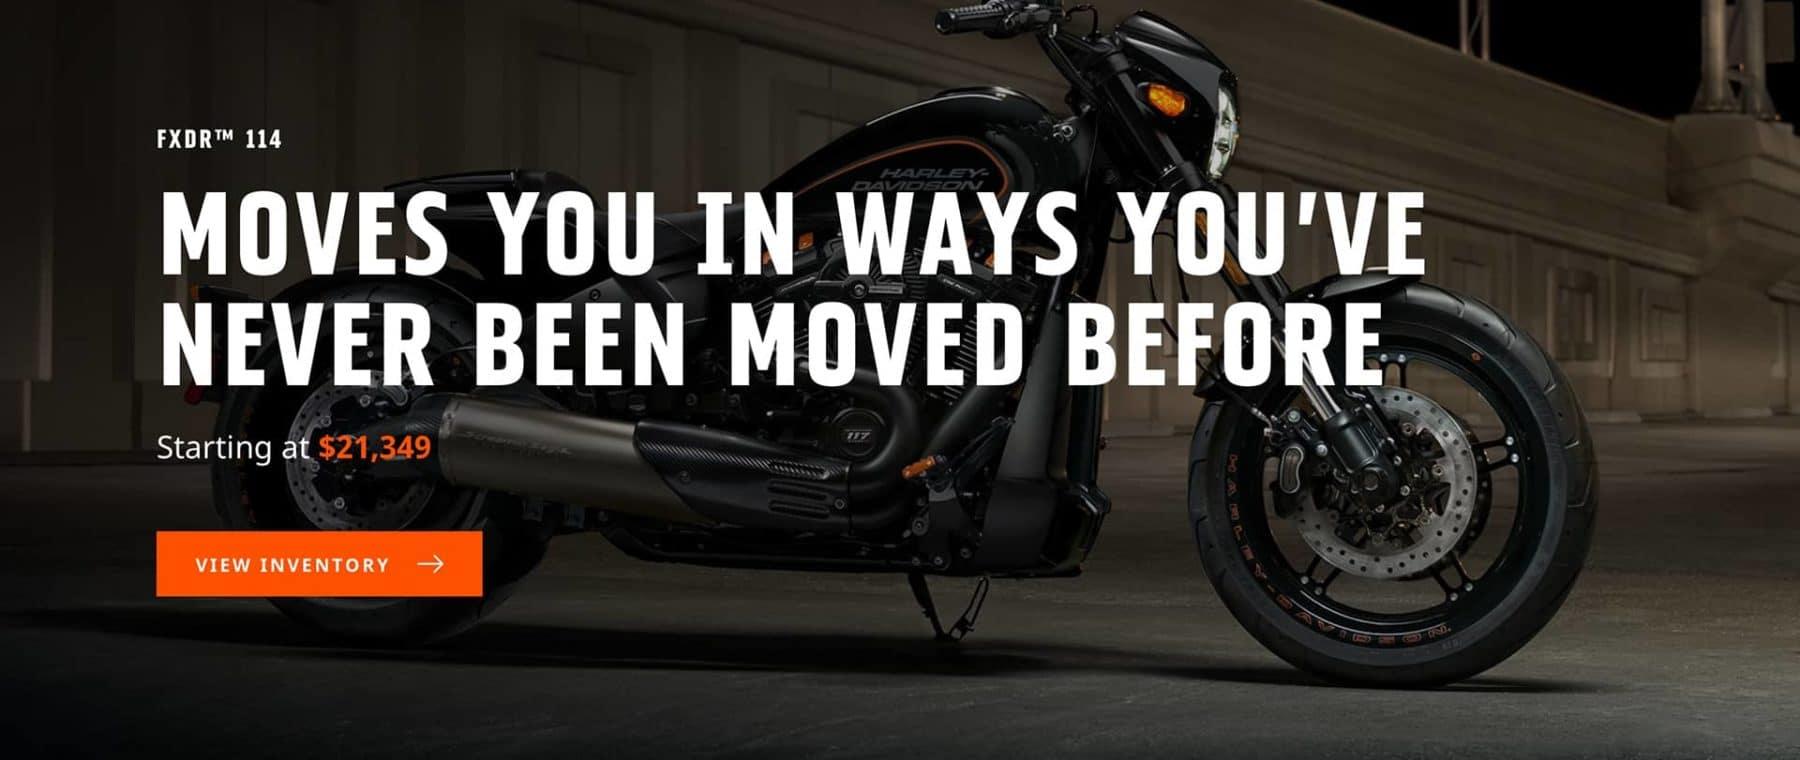 Harley Davidson Dealers Near Me >> Treasure Coast Harley Davidson Harley Davidson Dealer In